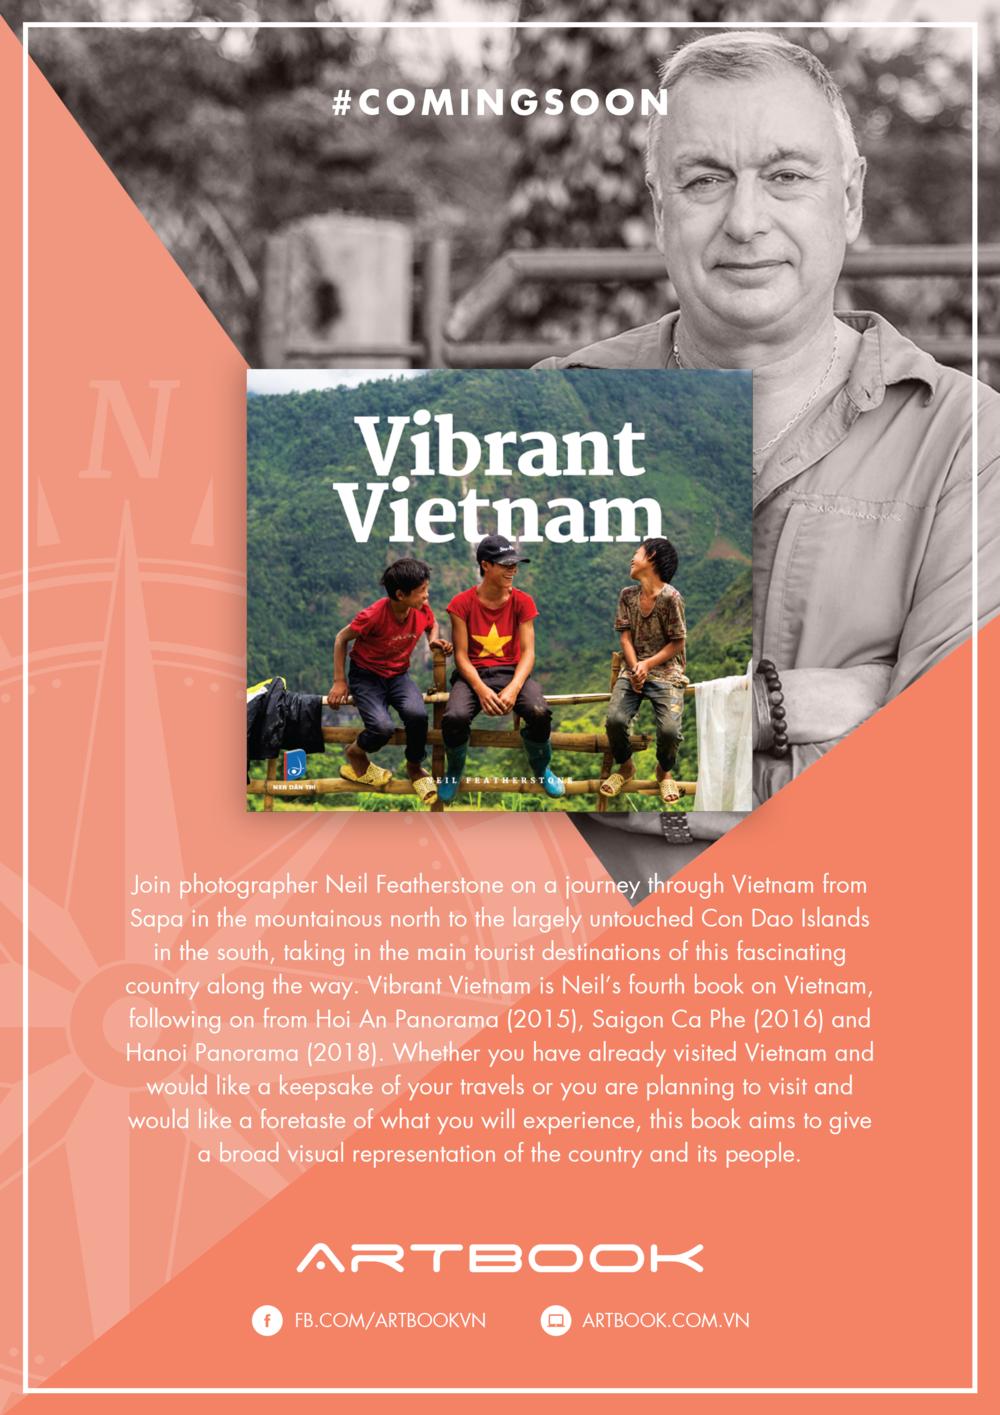 Vibrant Vietnam